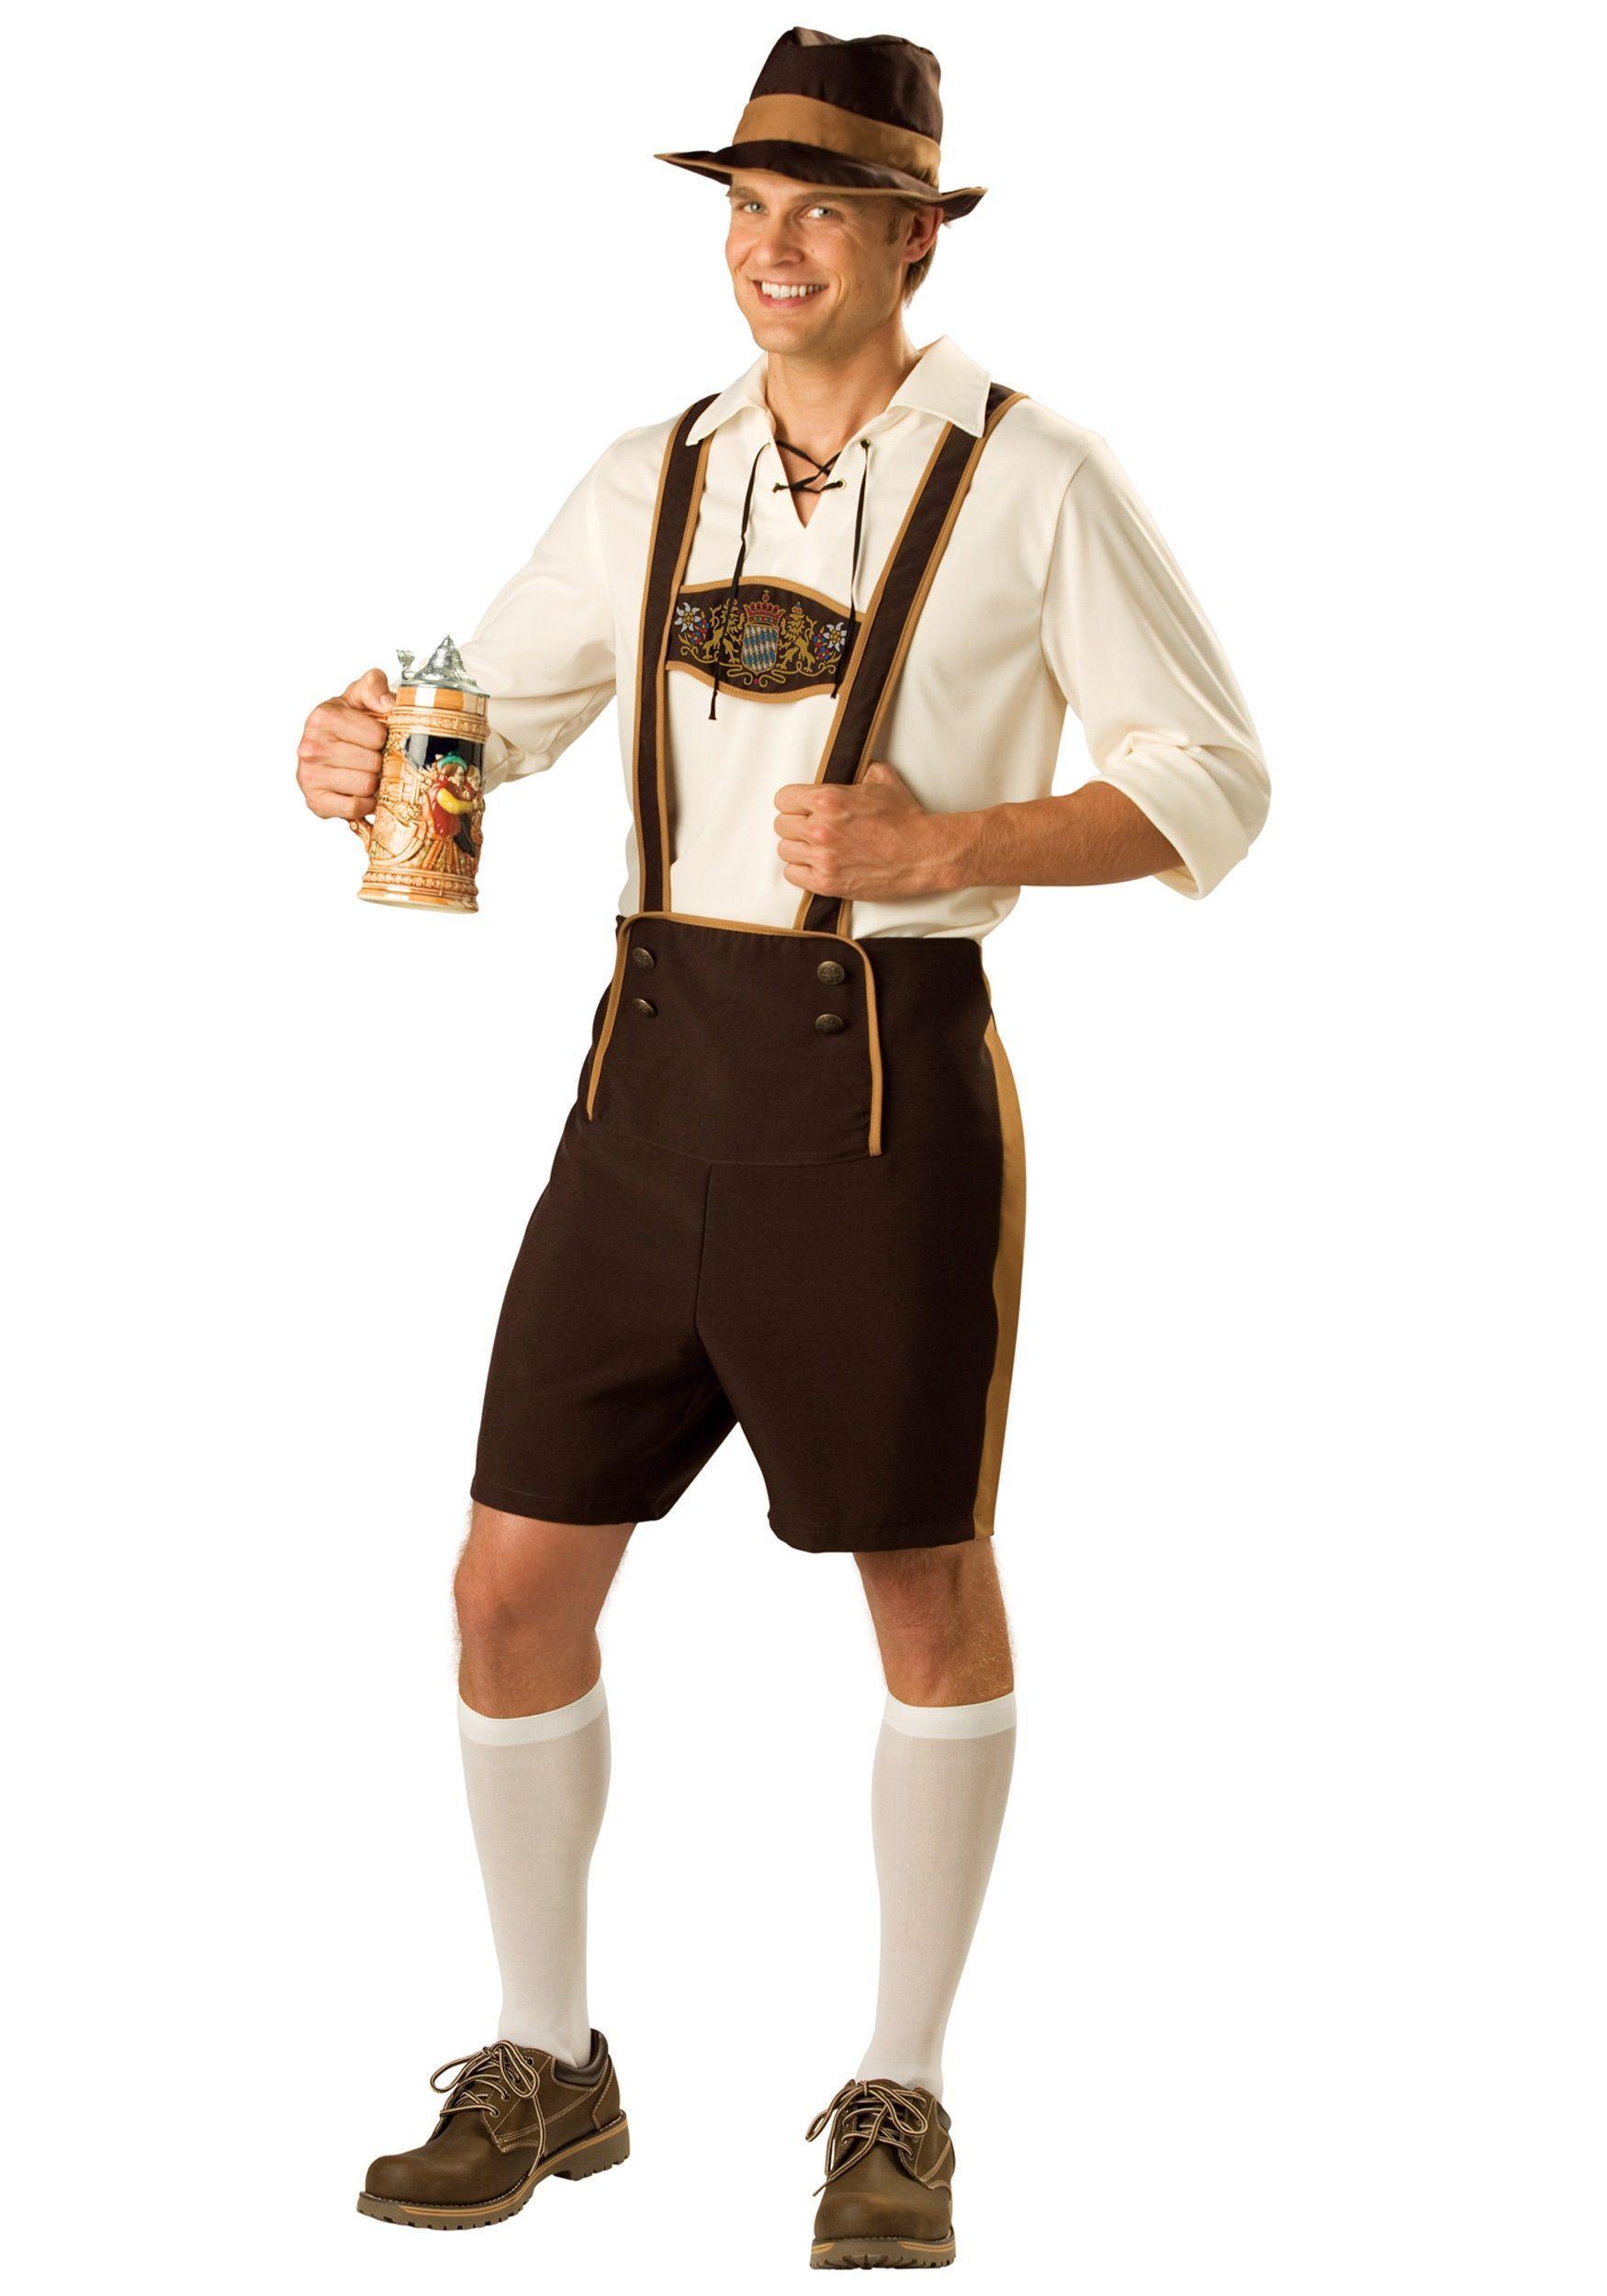 Men Oktoberfest Costume German Bavarian Lederhosen Beer Octoberfest Fancy Dress